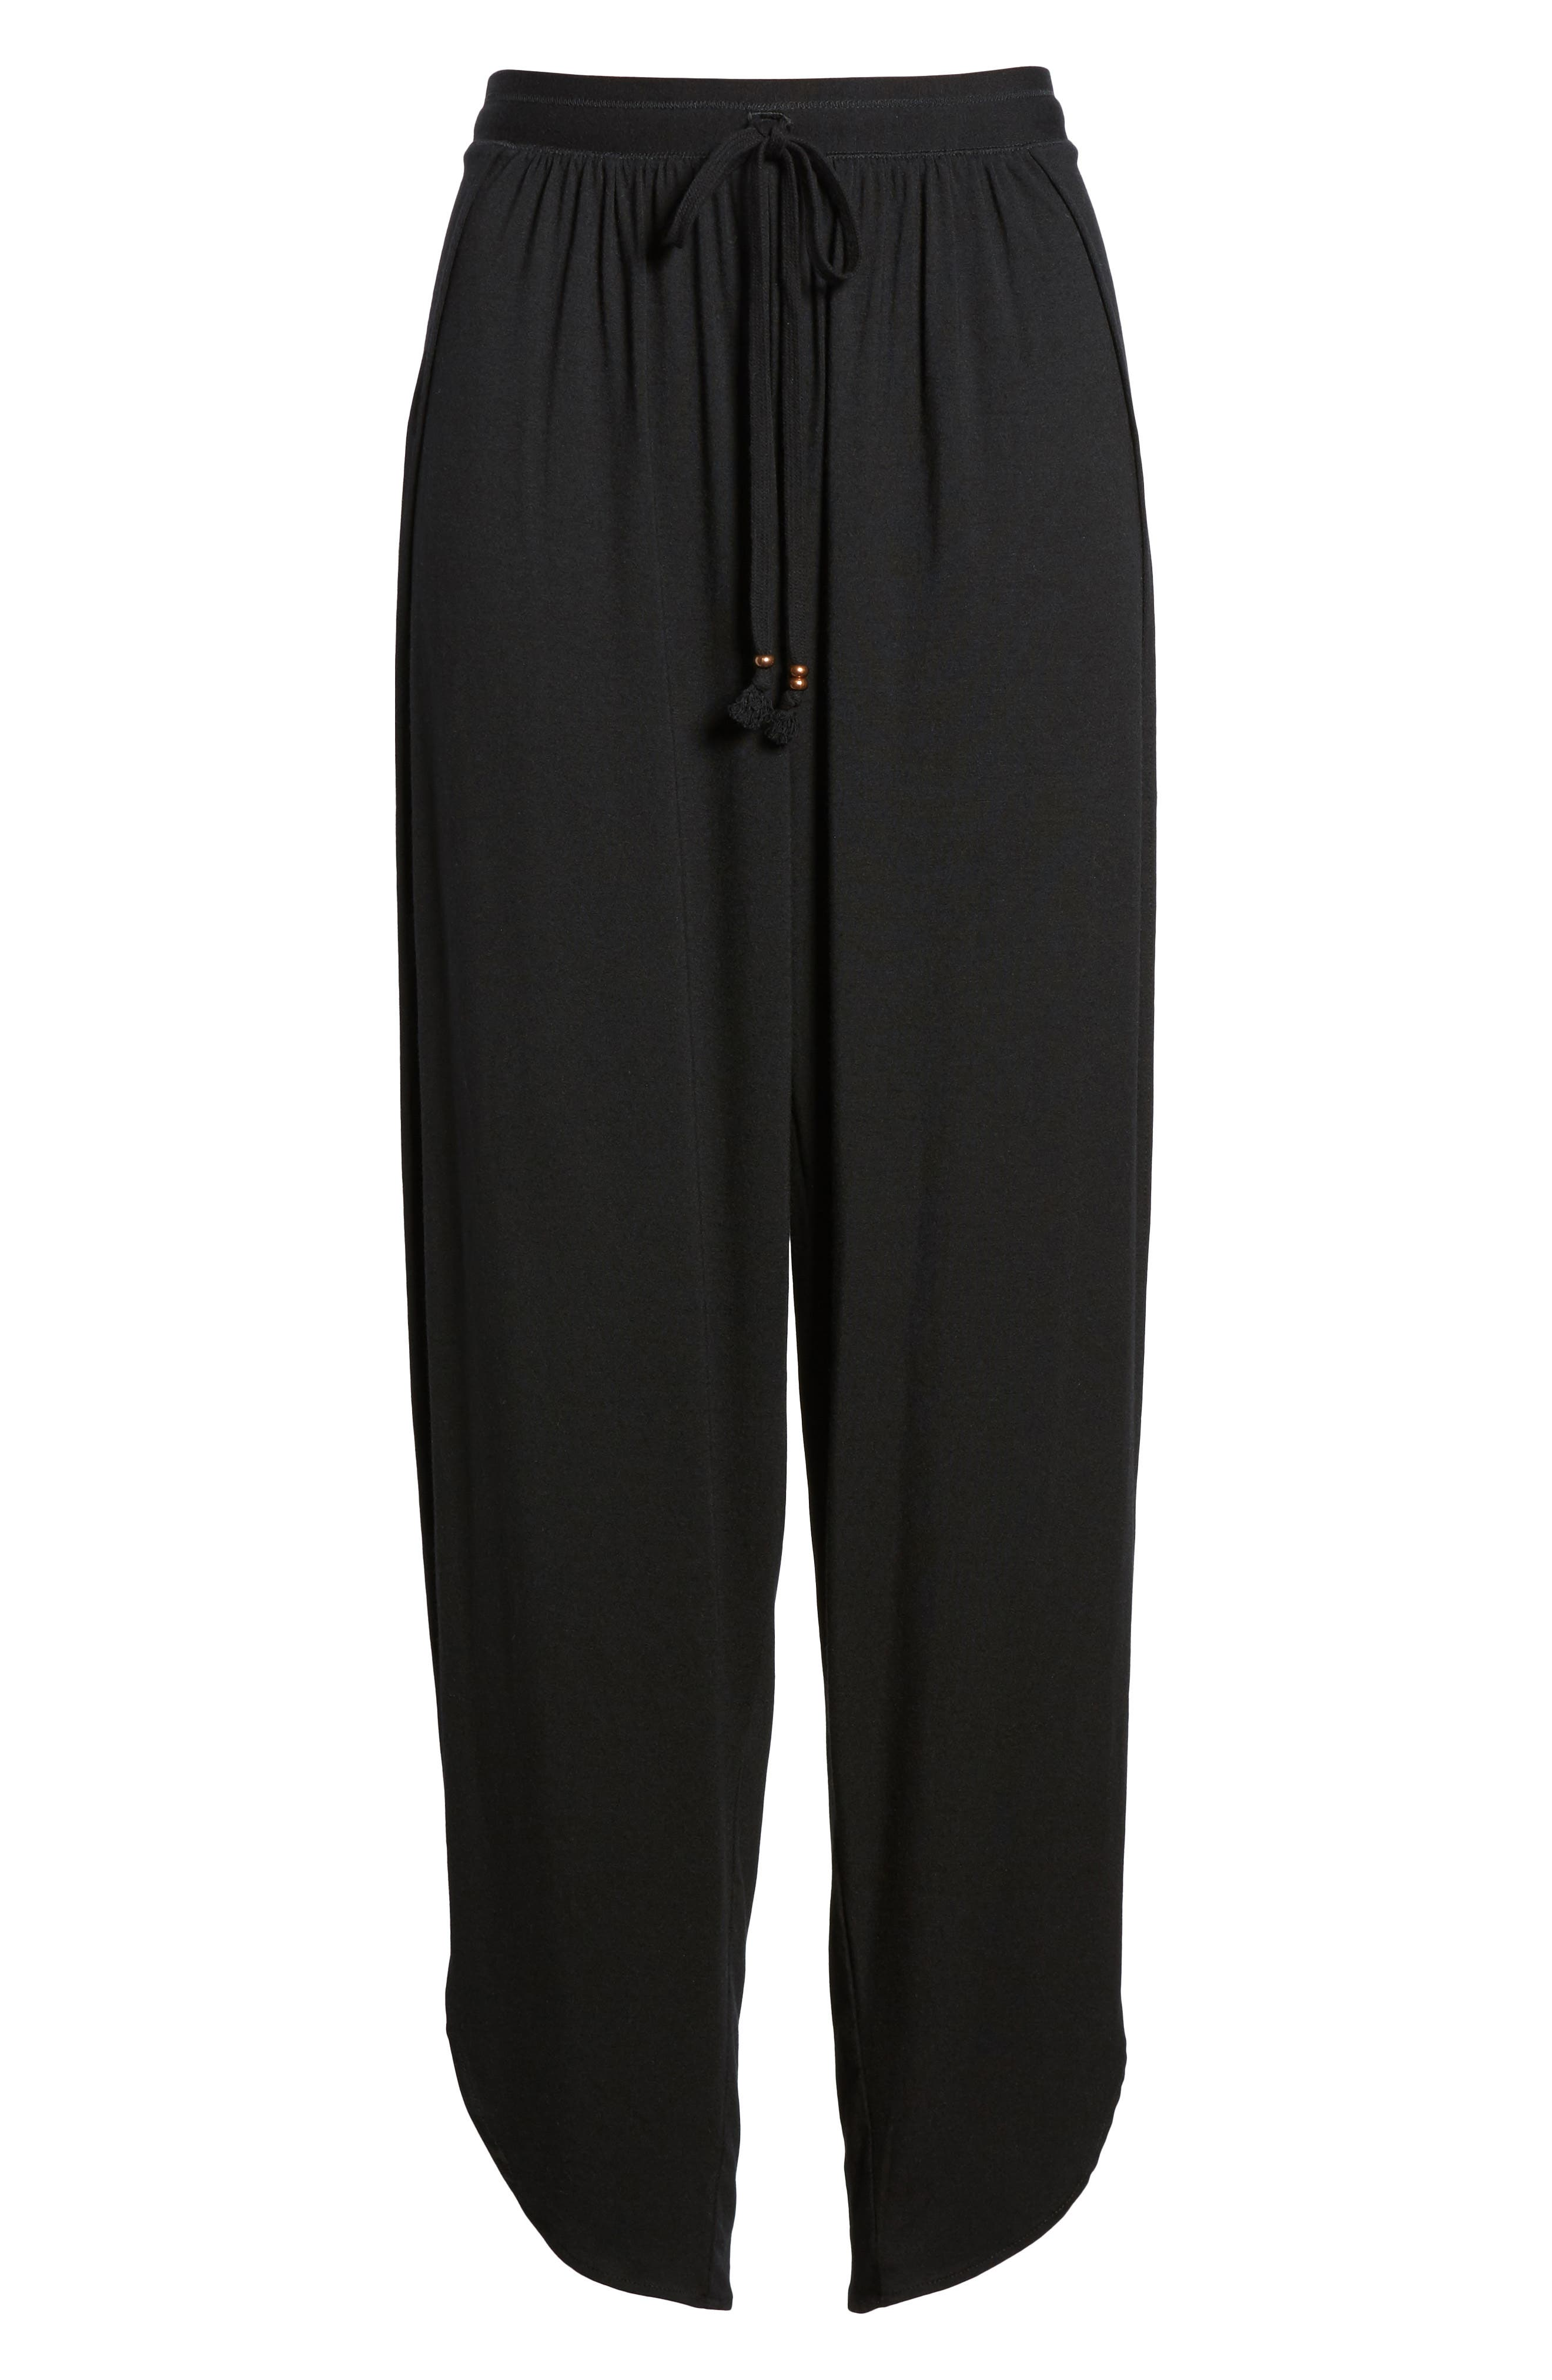 ROBIN PICCONE,                             Side Split Cover-Up Pants,                             Alternate thumbnail 7, color,                             BLACK